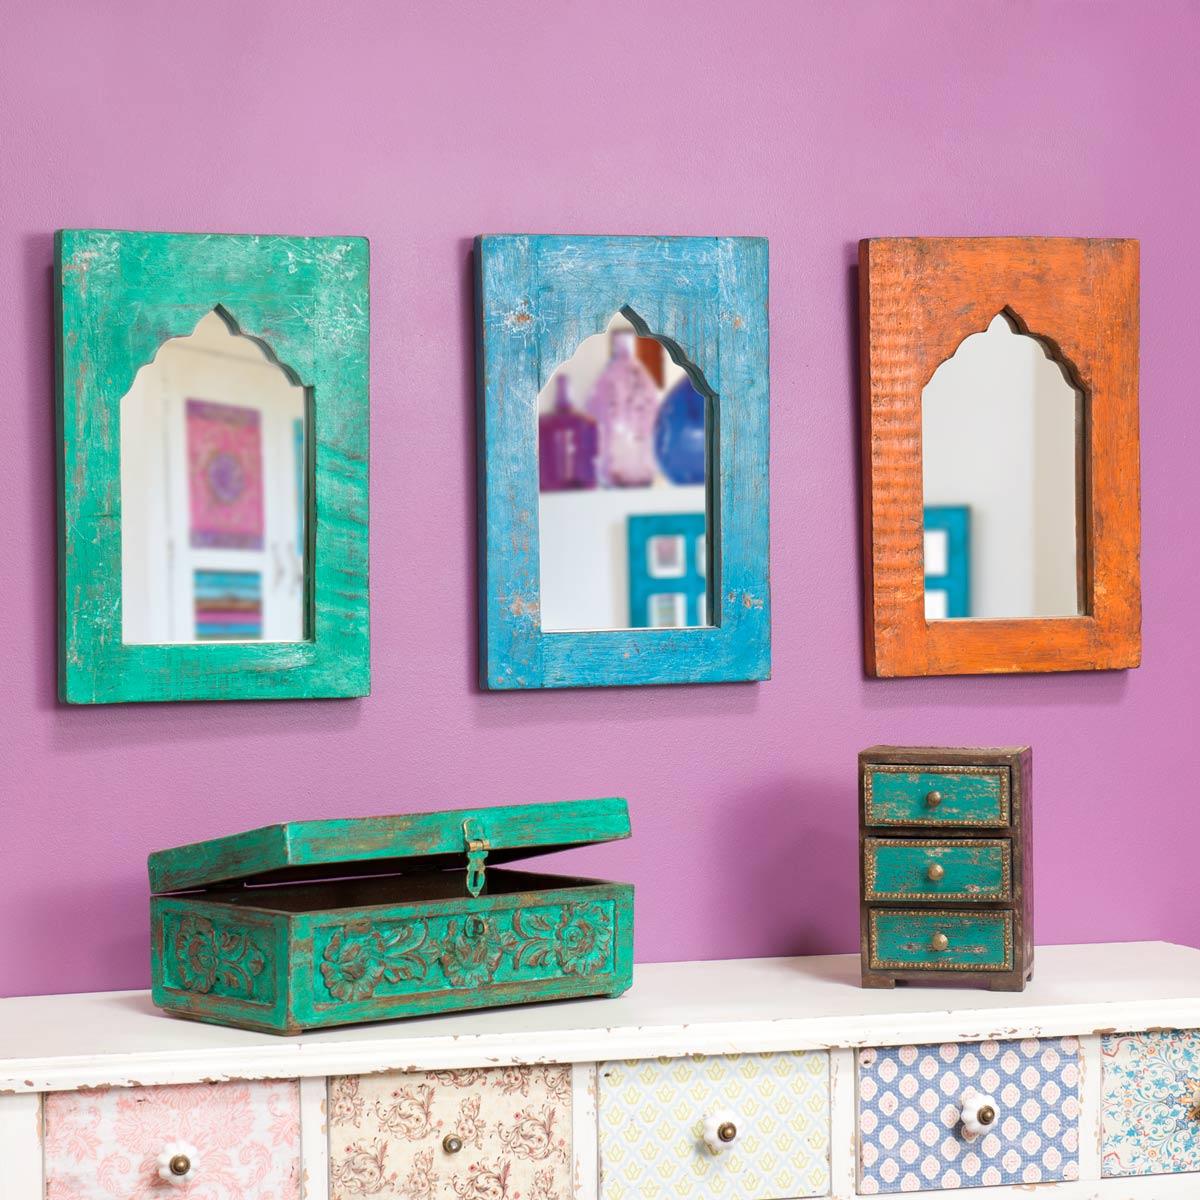 specchi i pi belli per arredare casa diredonna. Black Bedroom Furniture Sets. Home Design Ideas